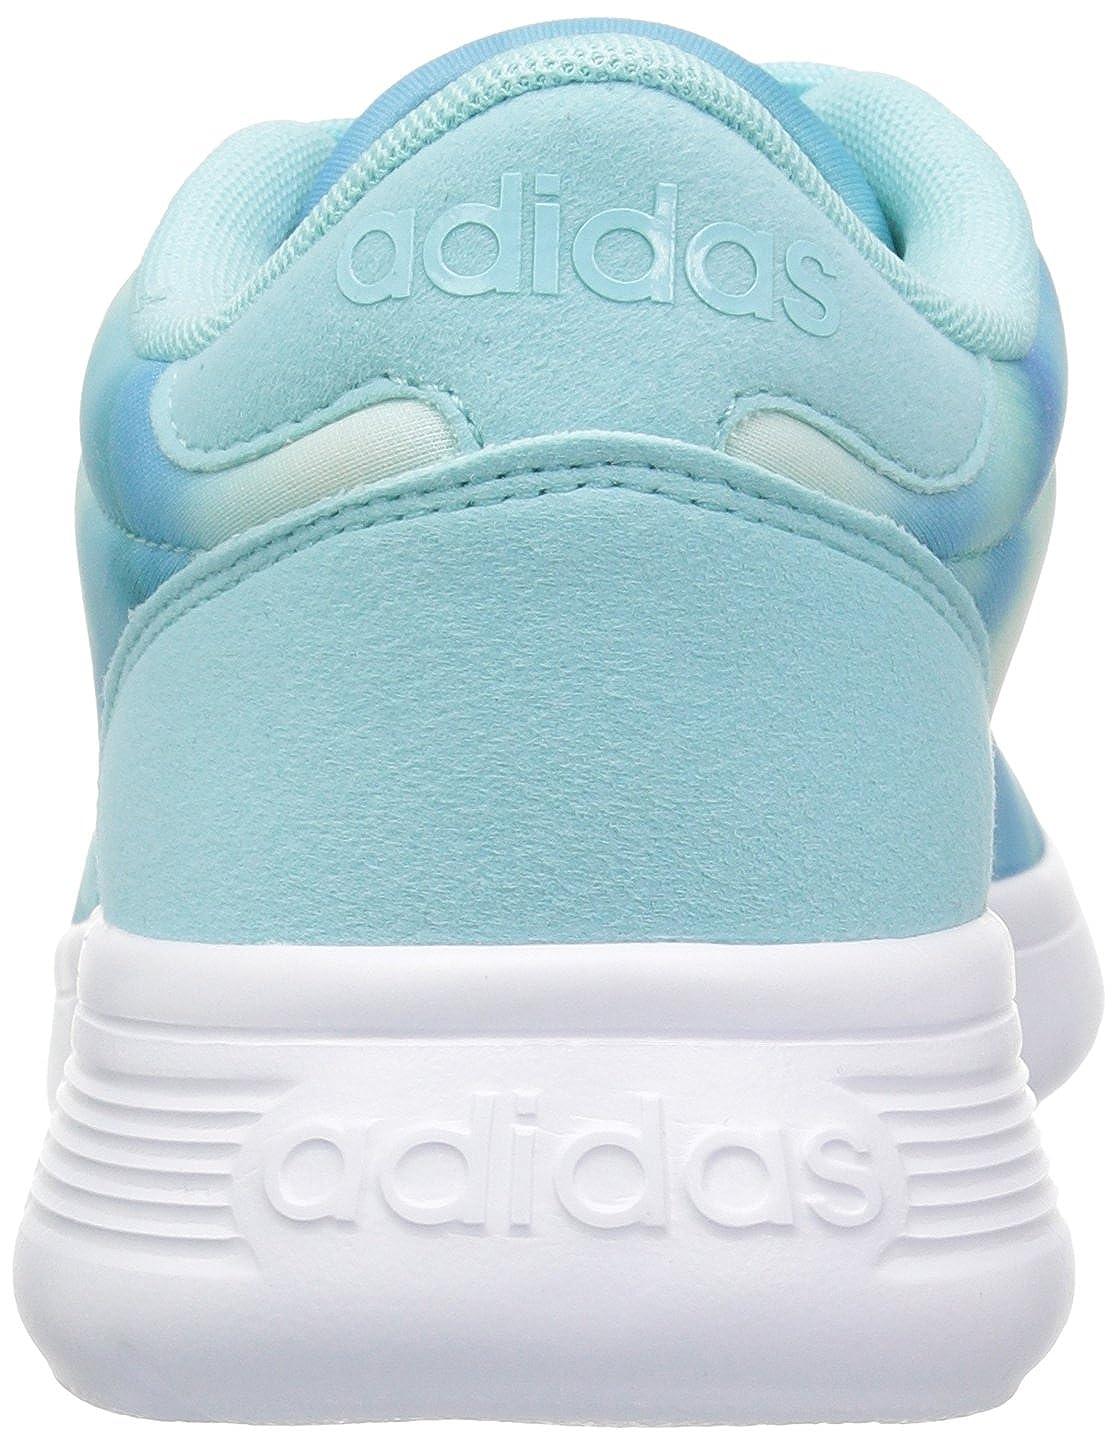 adidas Womens Lite Racer w Running Shoe adidas NEO LITE RACER W-W ... c968aeb9a